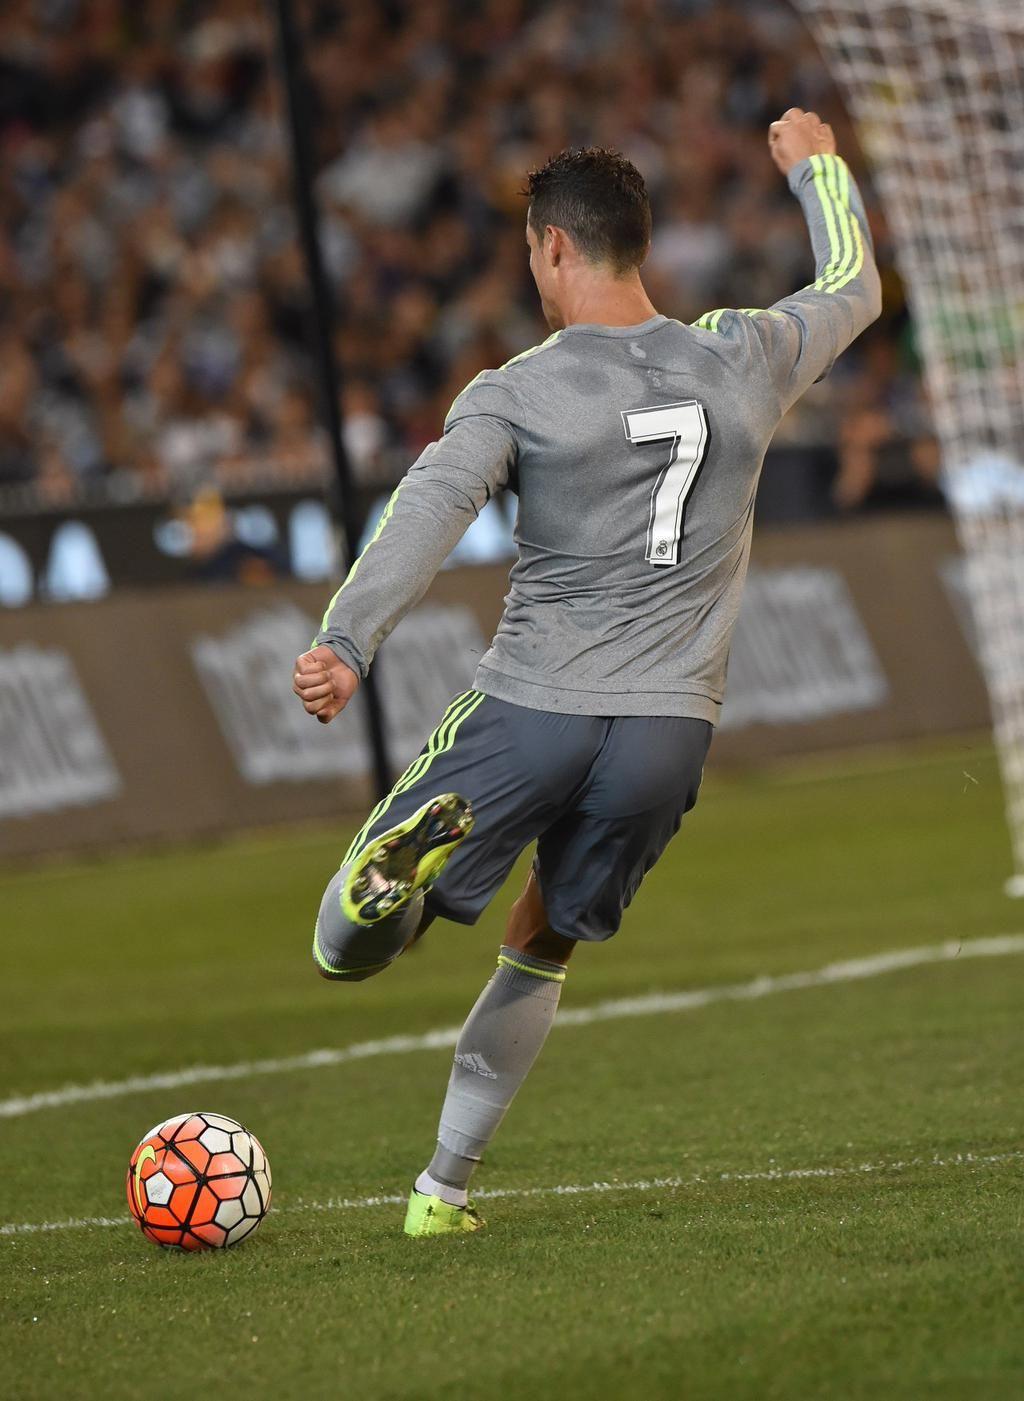 Realesparta On Twitter Crstiano Ronaldo Cristiano Ronaldo Cr7 Cristano Ronaldo